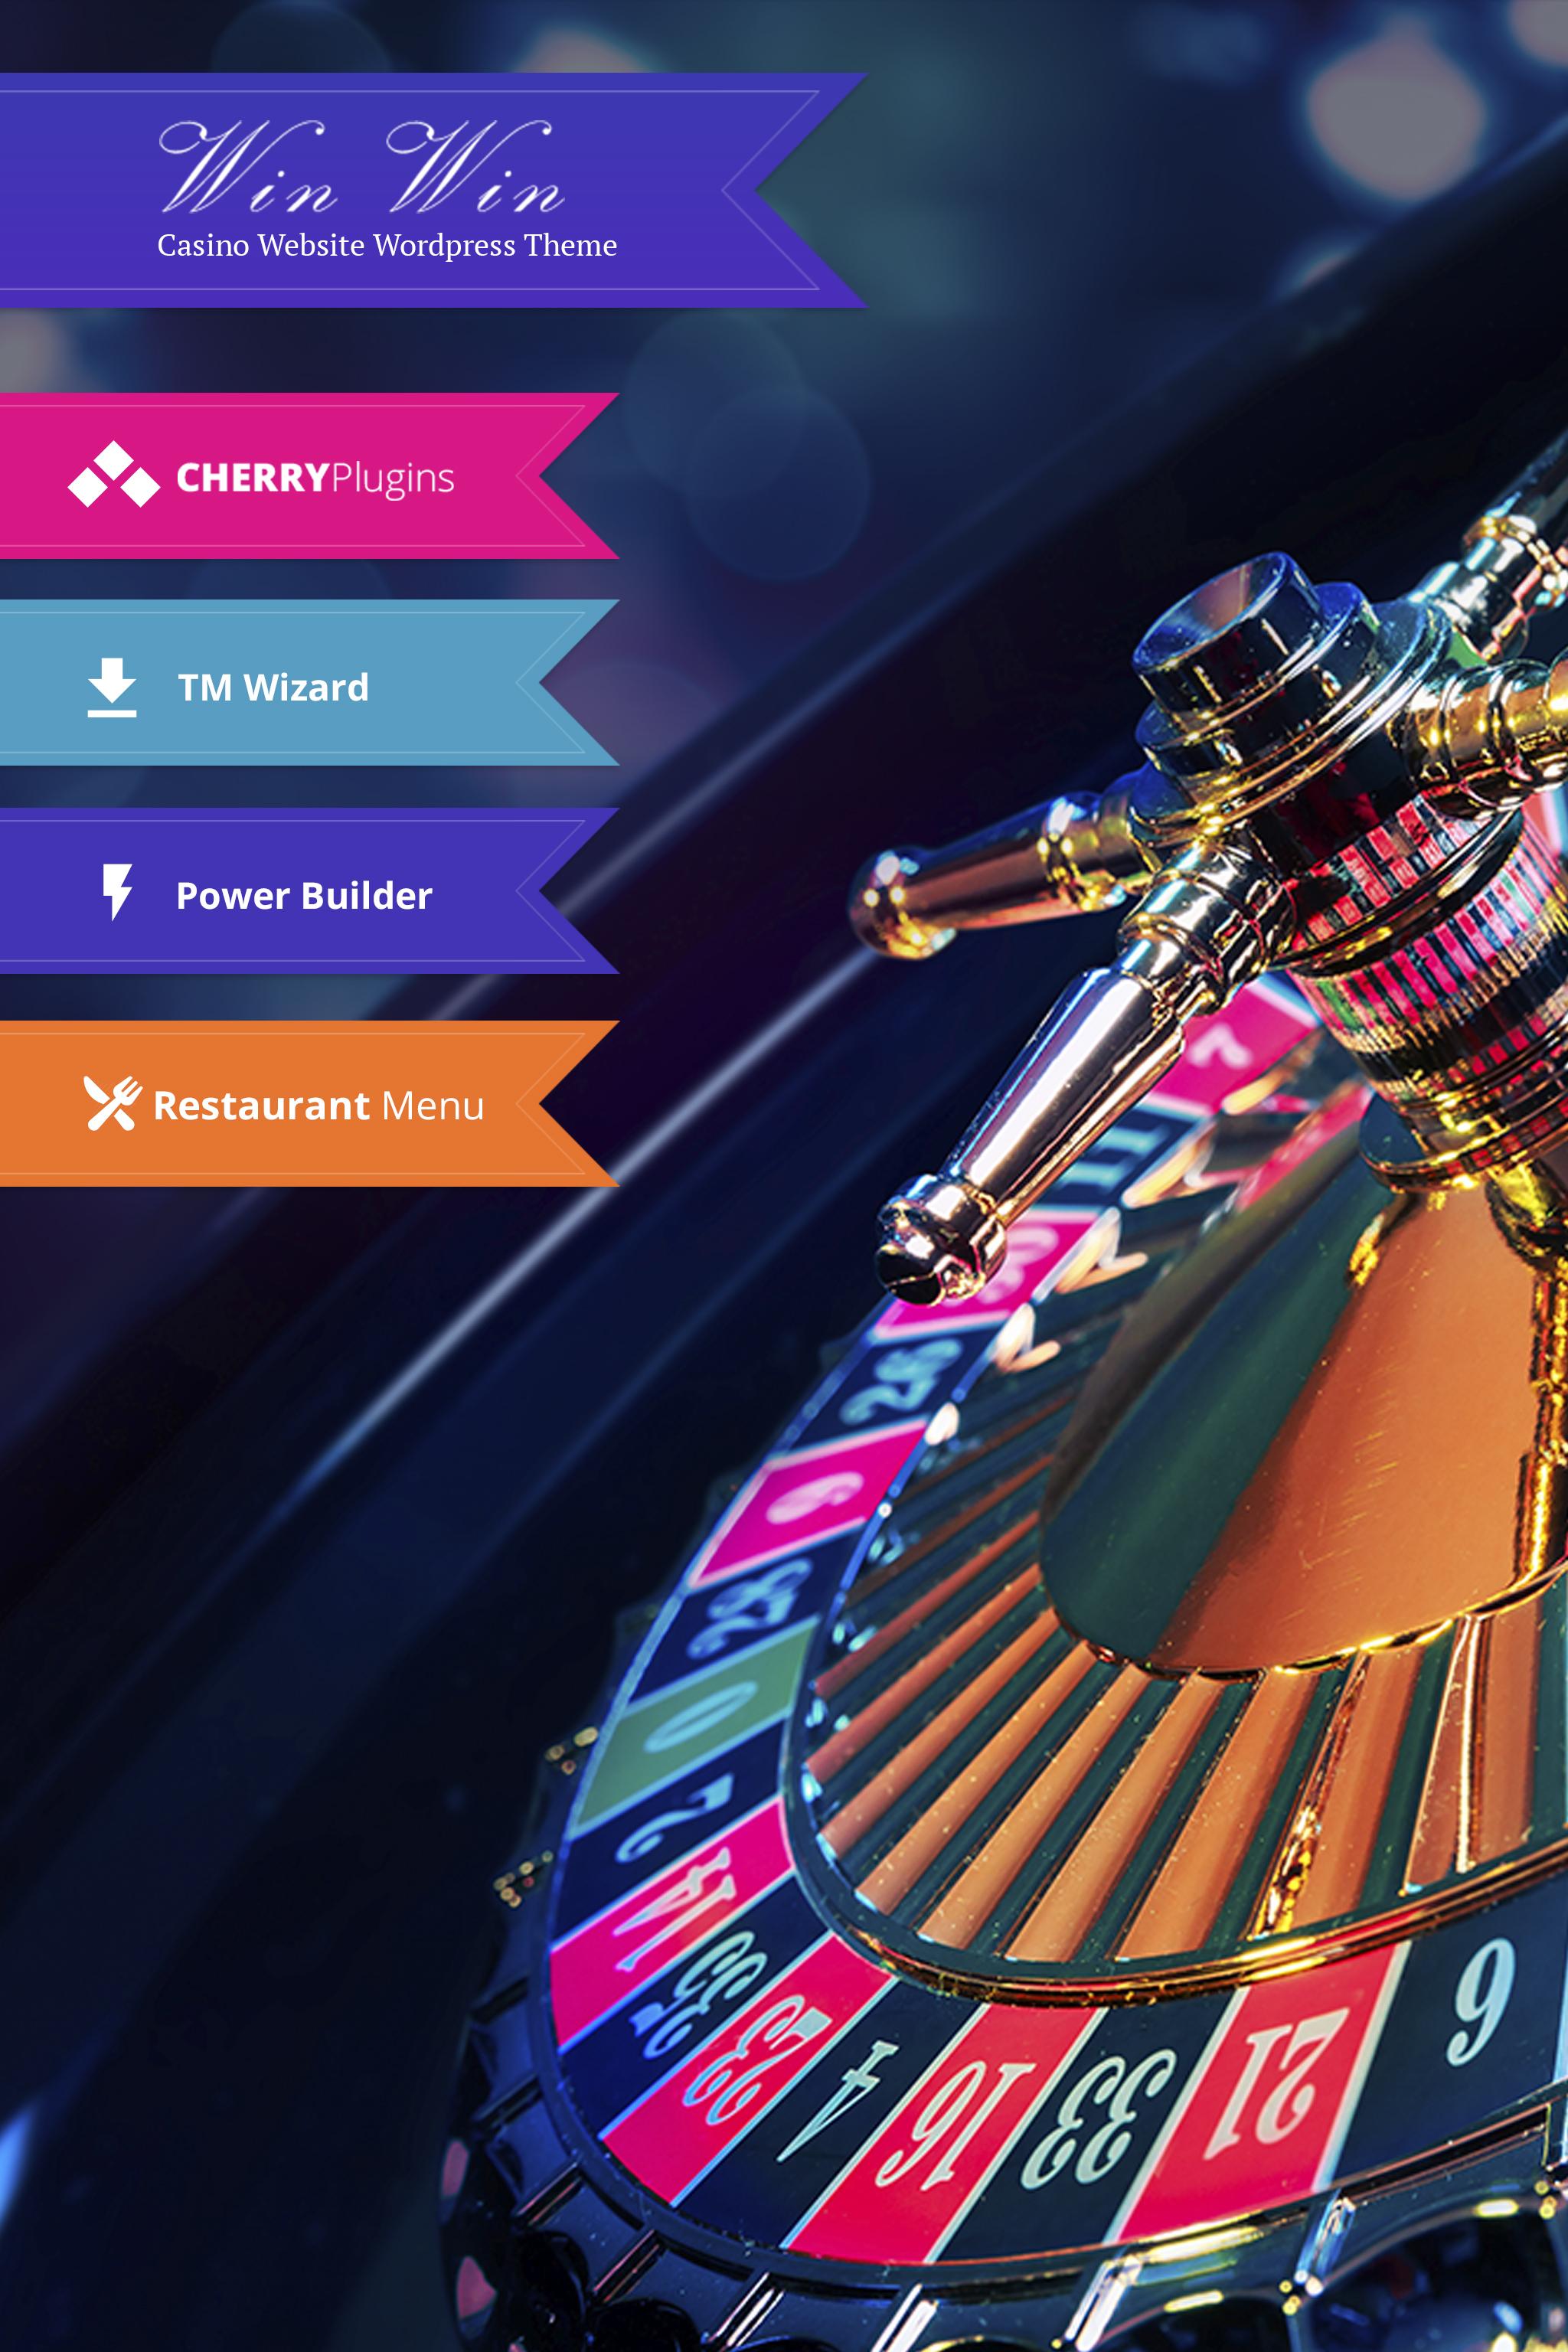 WinWin - Casino Website WordPress Theme №64702 - скриншот